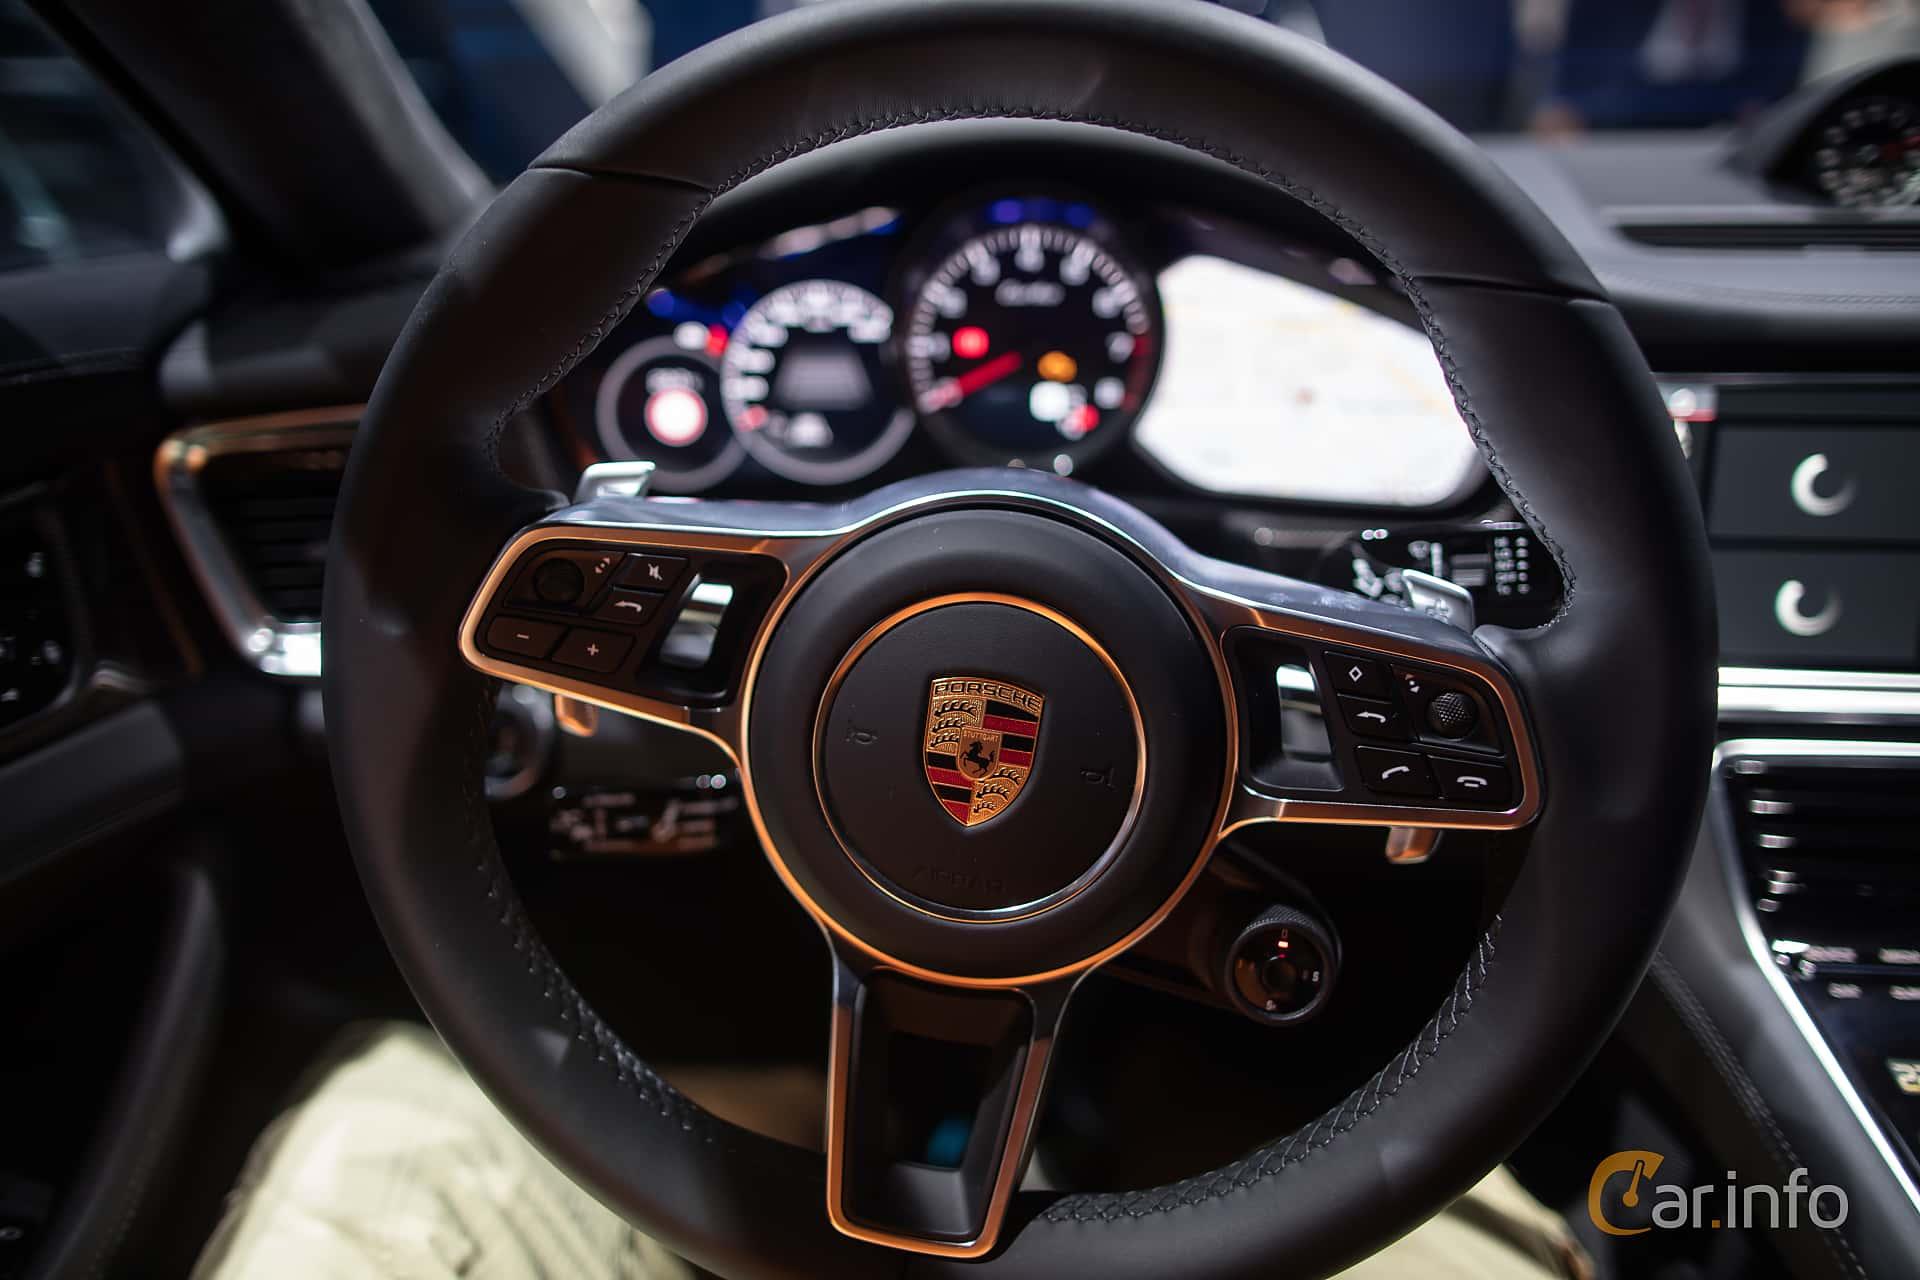 100 Porsche Panamera 2017 Interior 2017 Porsche Panamera Spied Fully Exposed Inside And